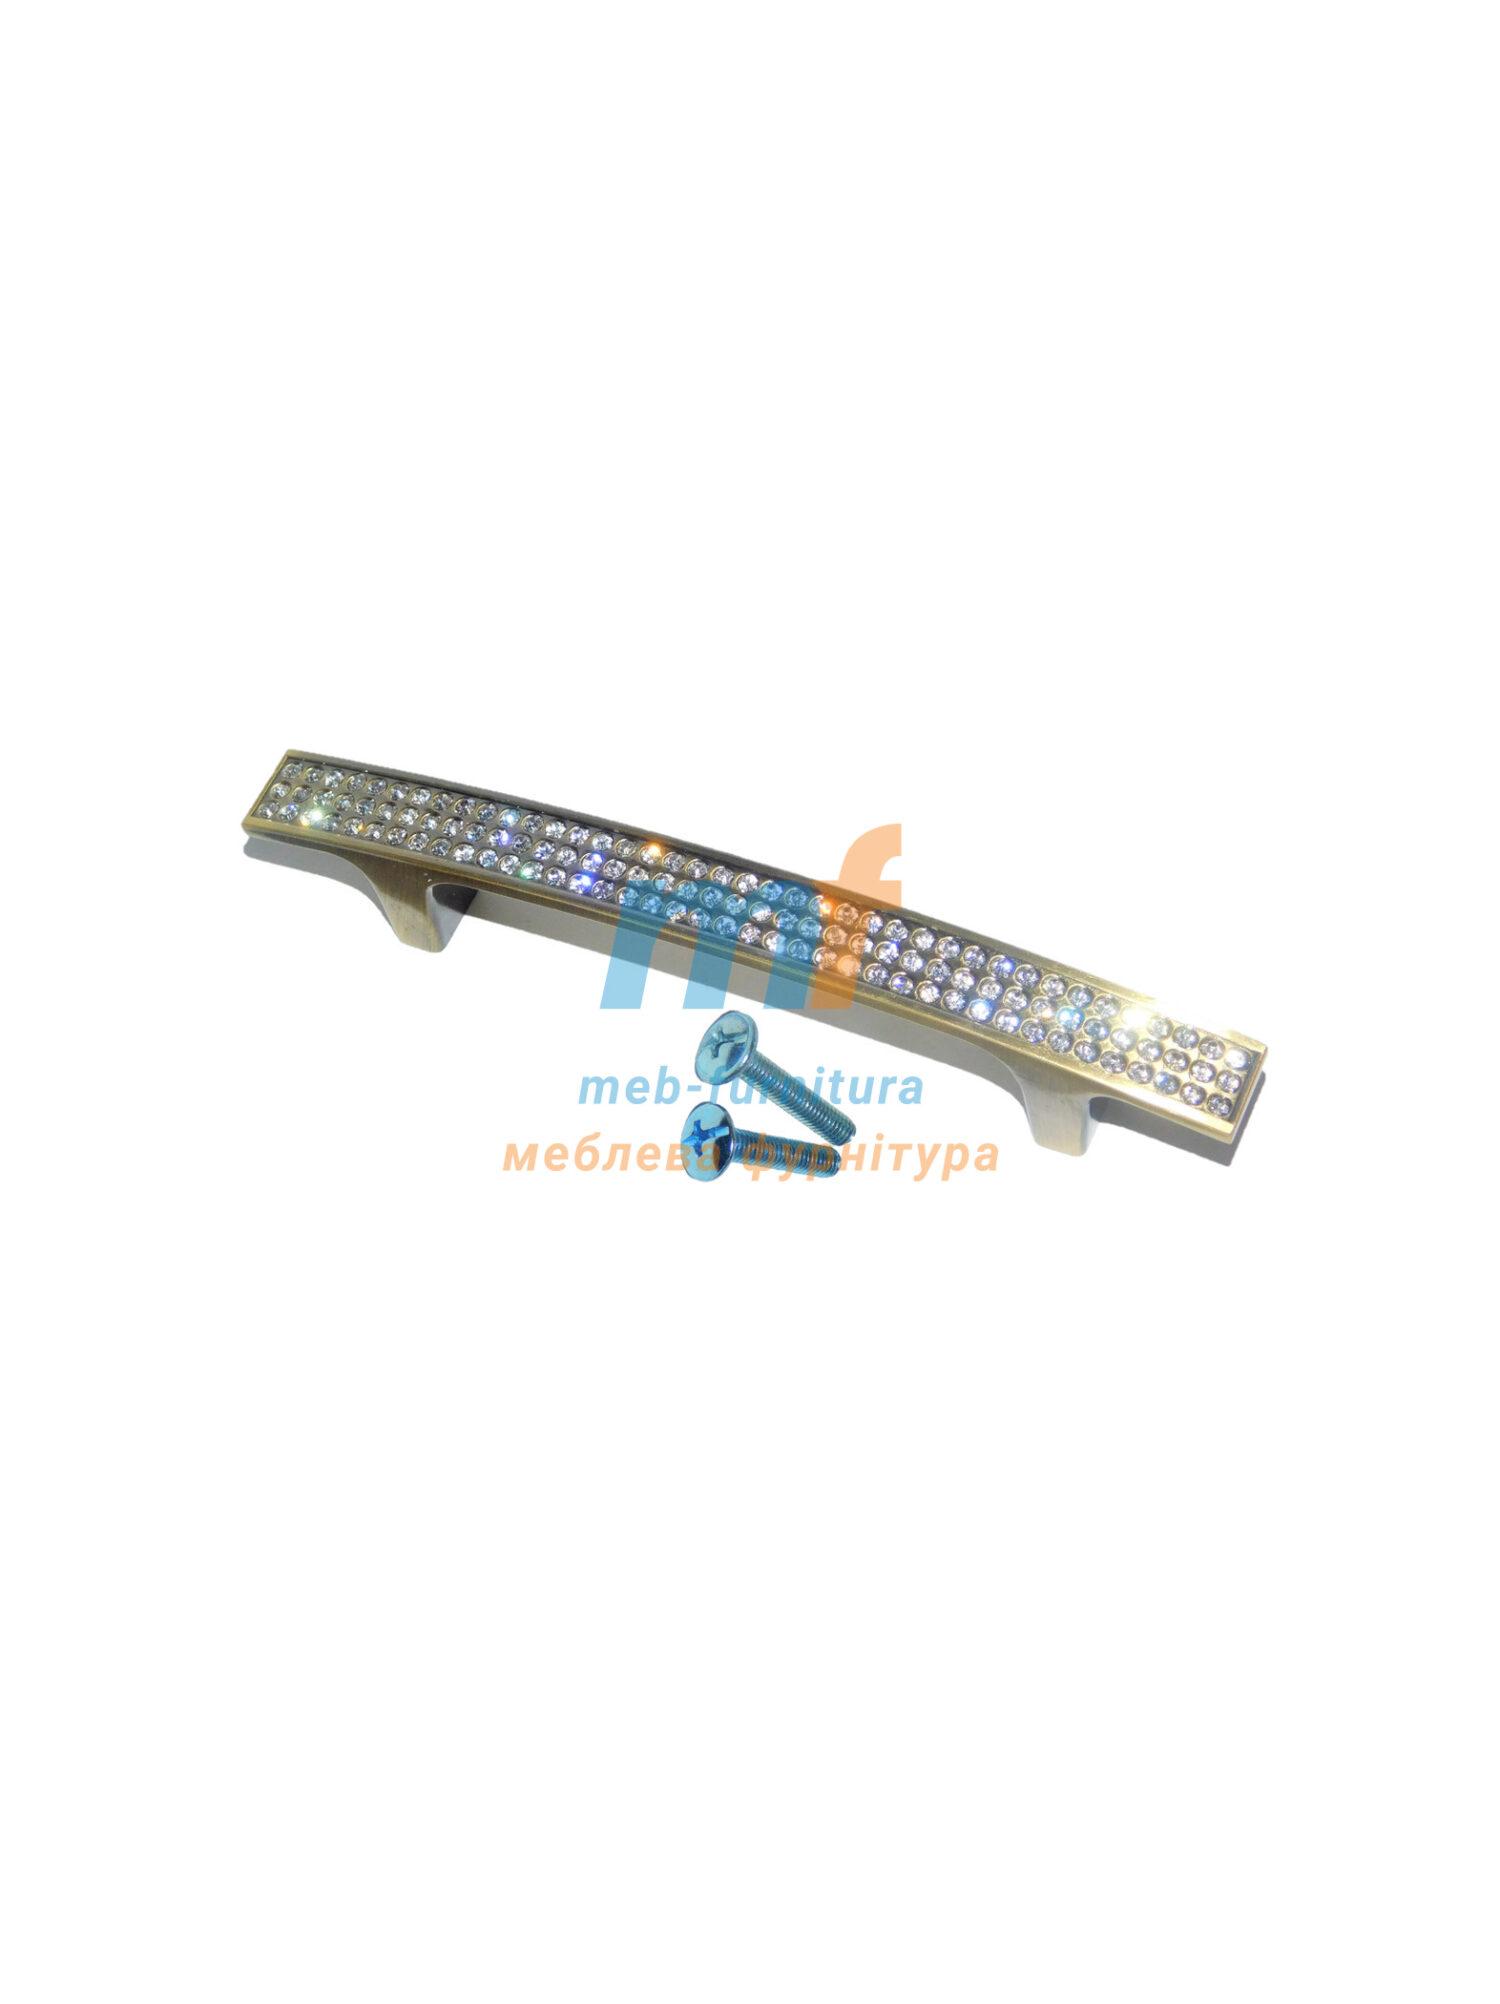 Ручка мебельная KRISTAL 05-96mm Бронза